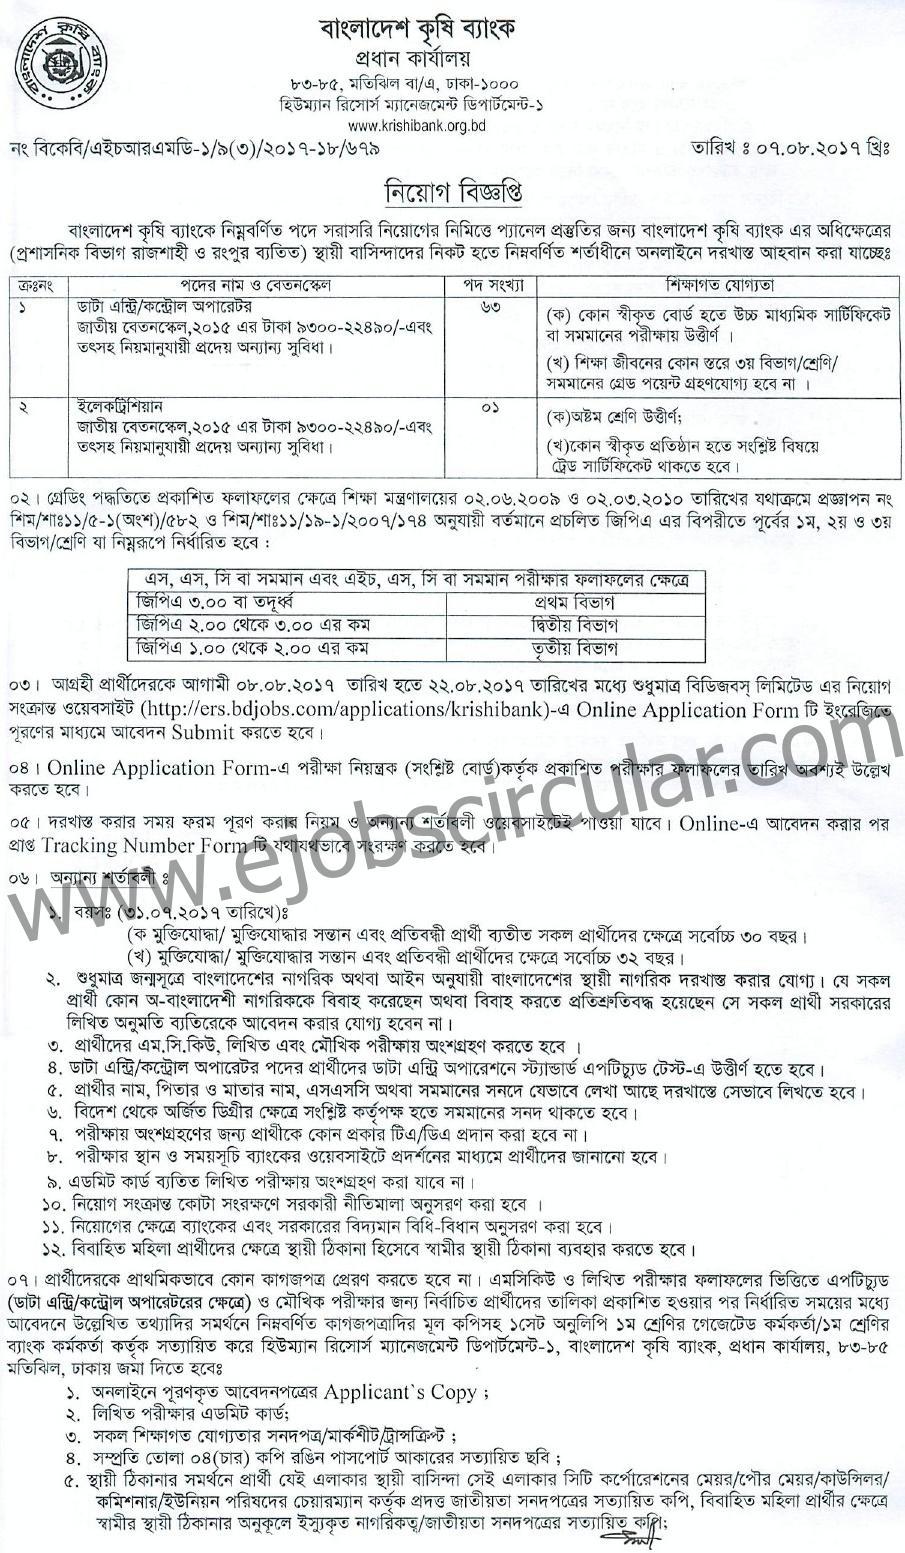 Bangladesh Krishi Bank Jobs Circular